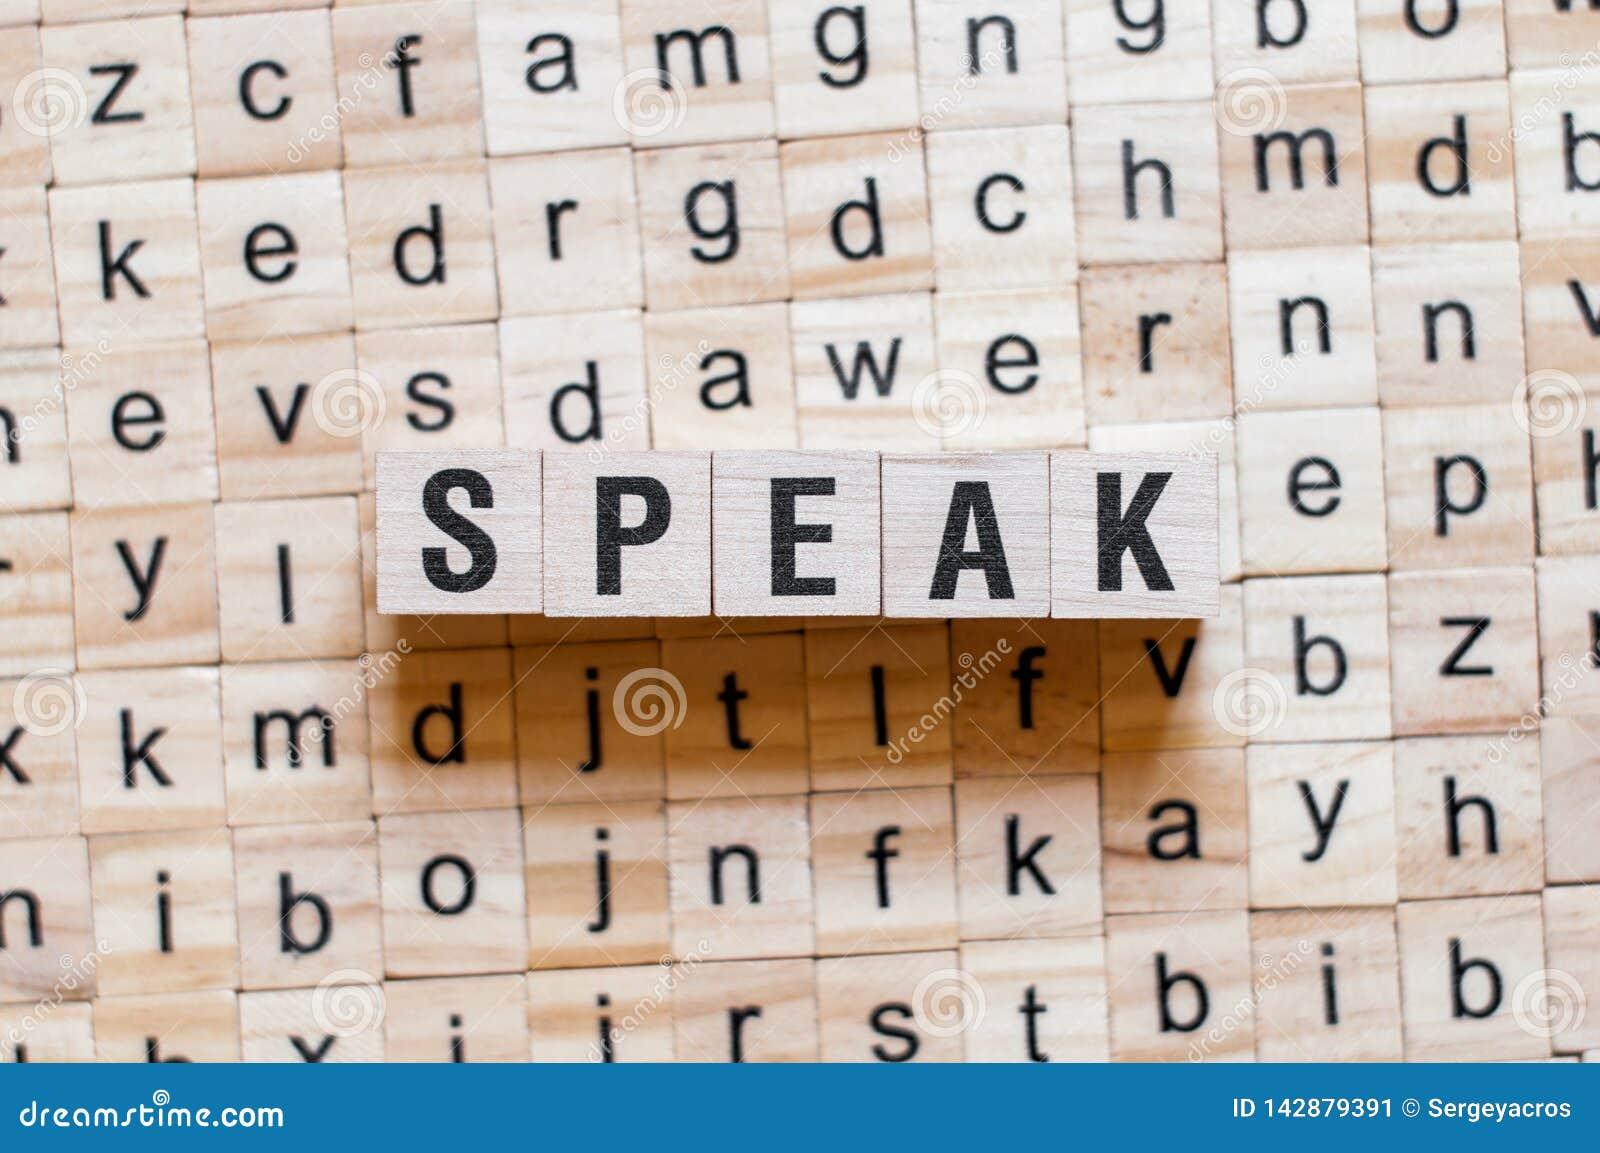 Speak word concept